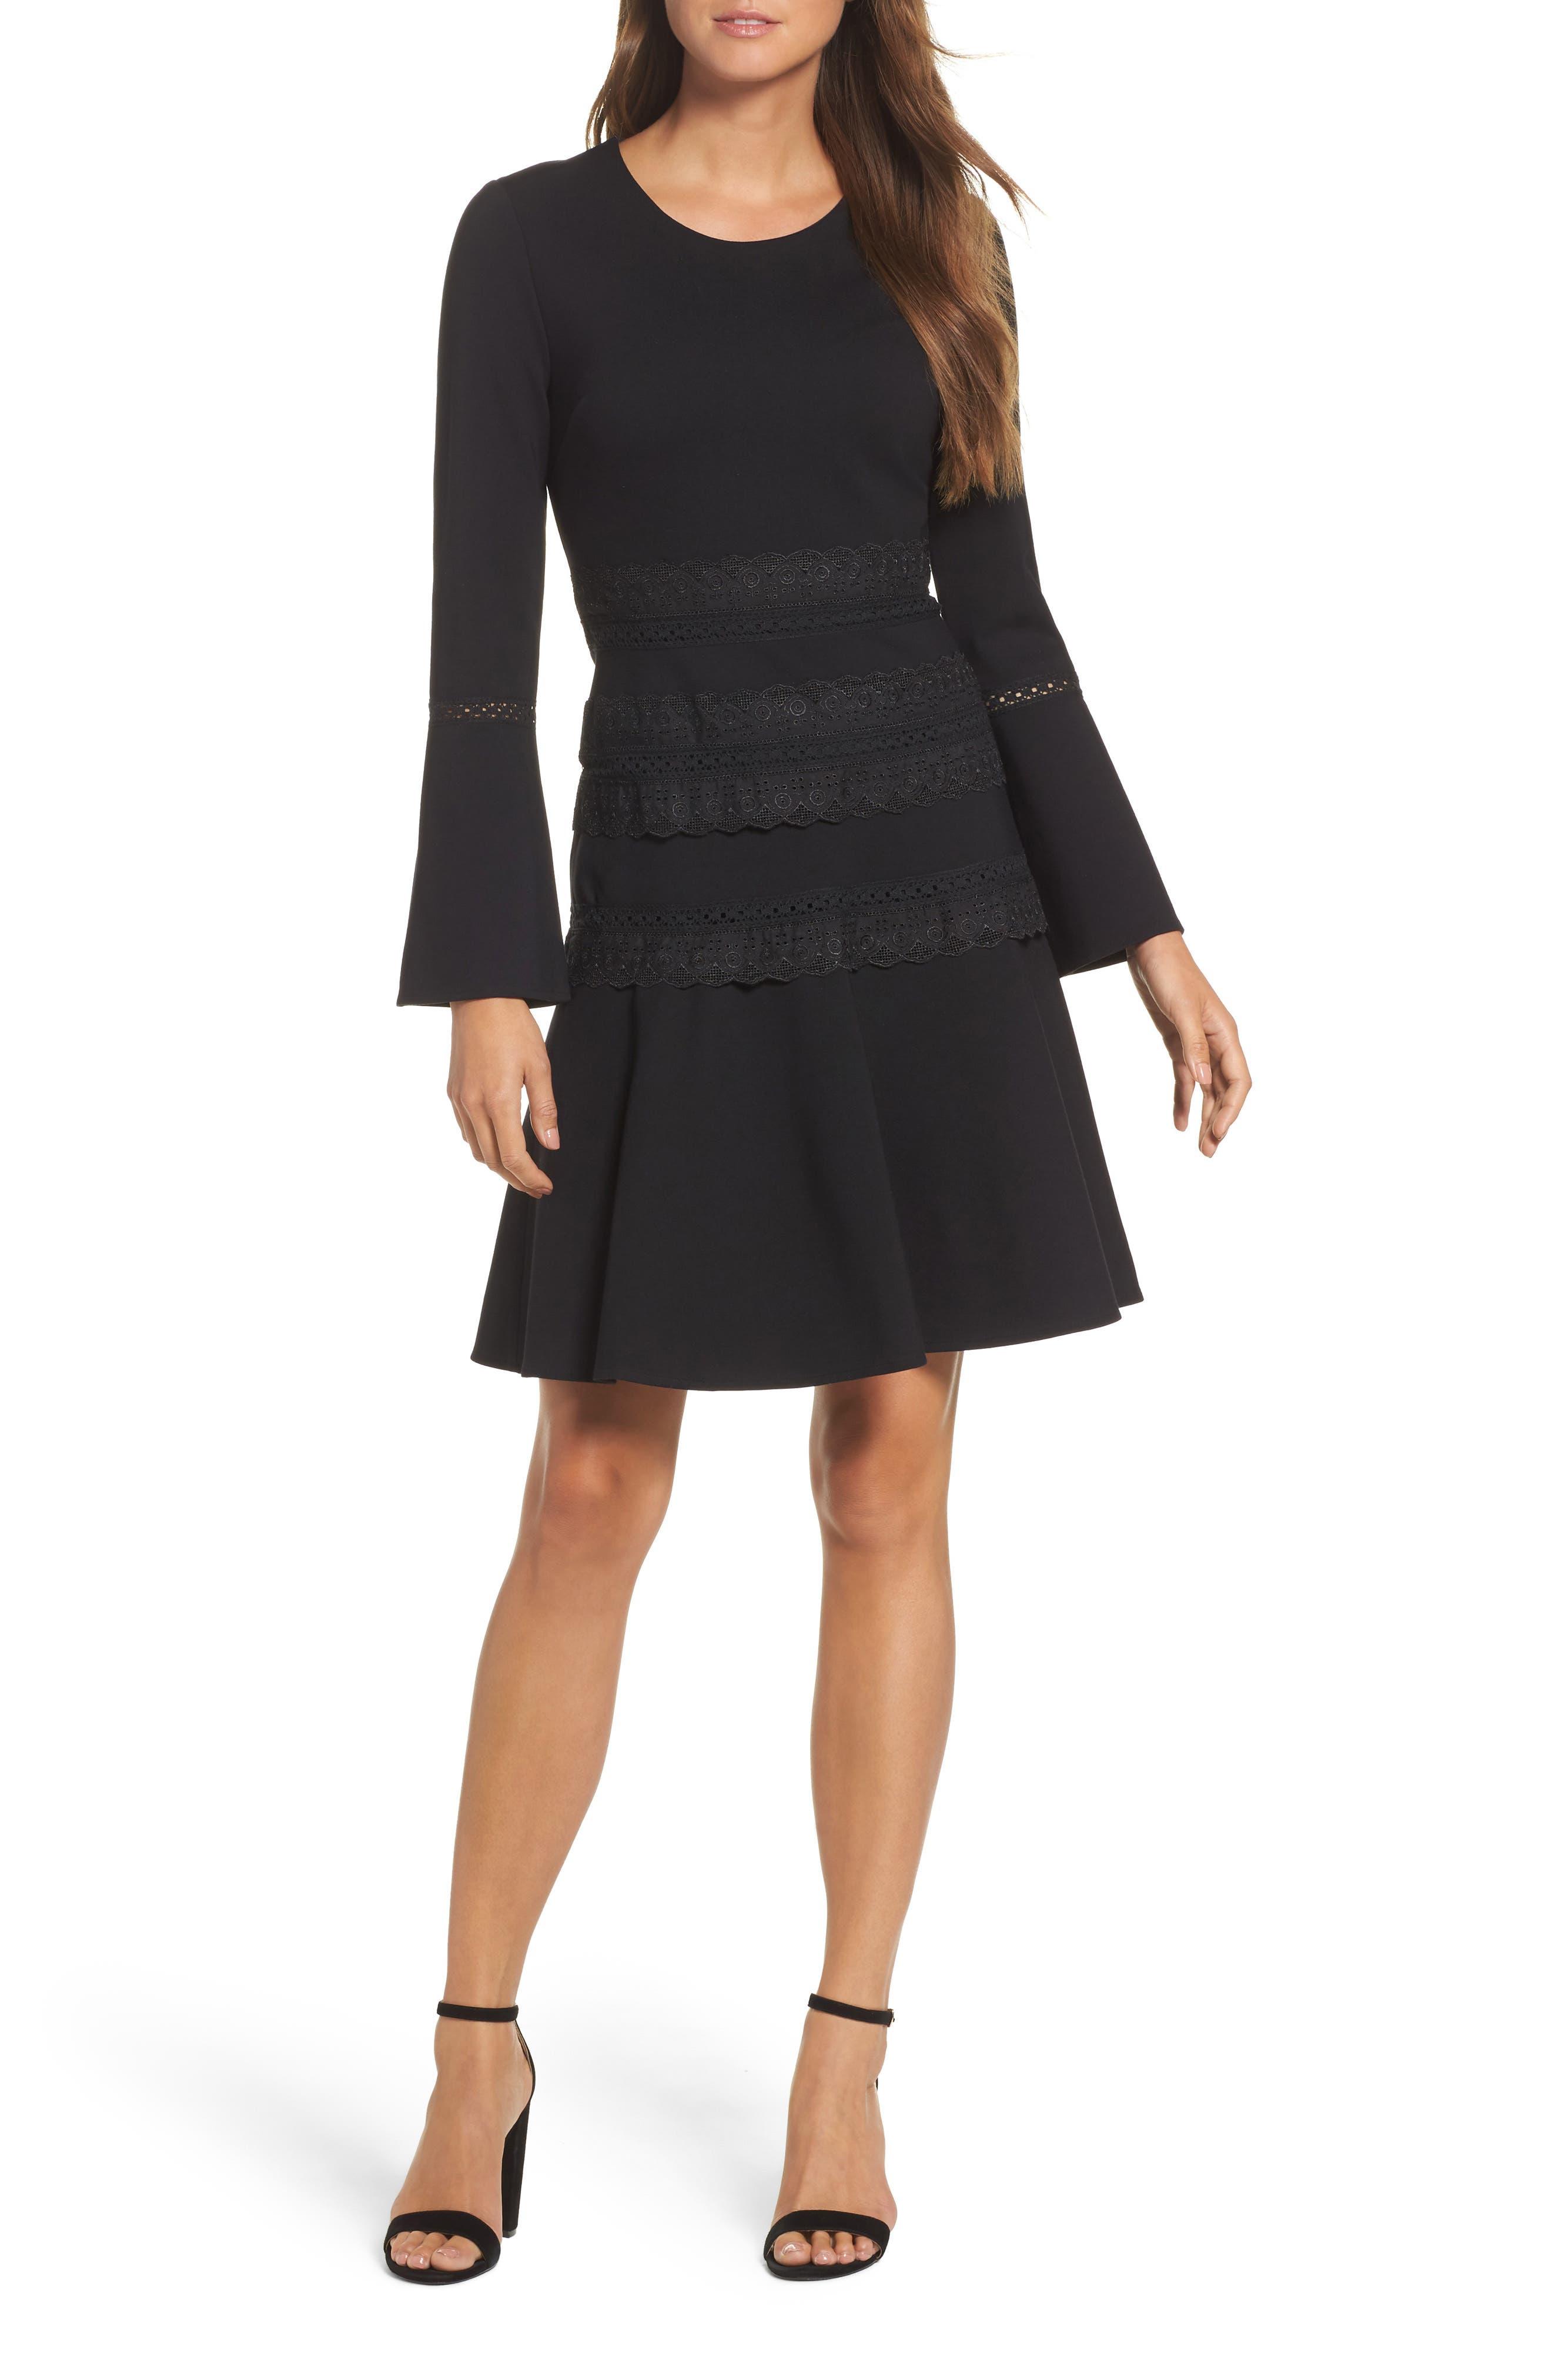 Kobi Halperin Preslie Double Knit A-Line Dress (Nordstrom Exclusive)